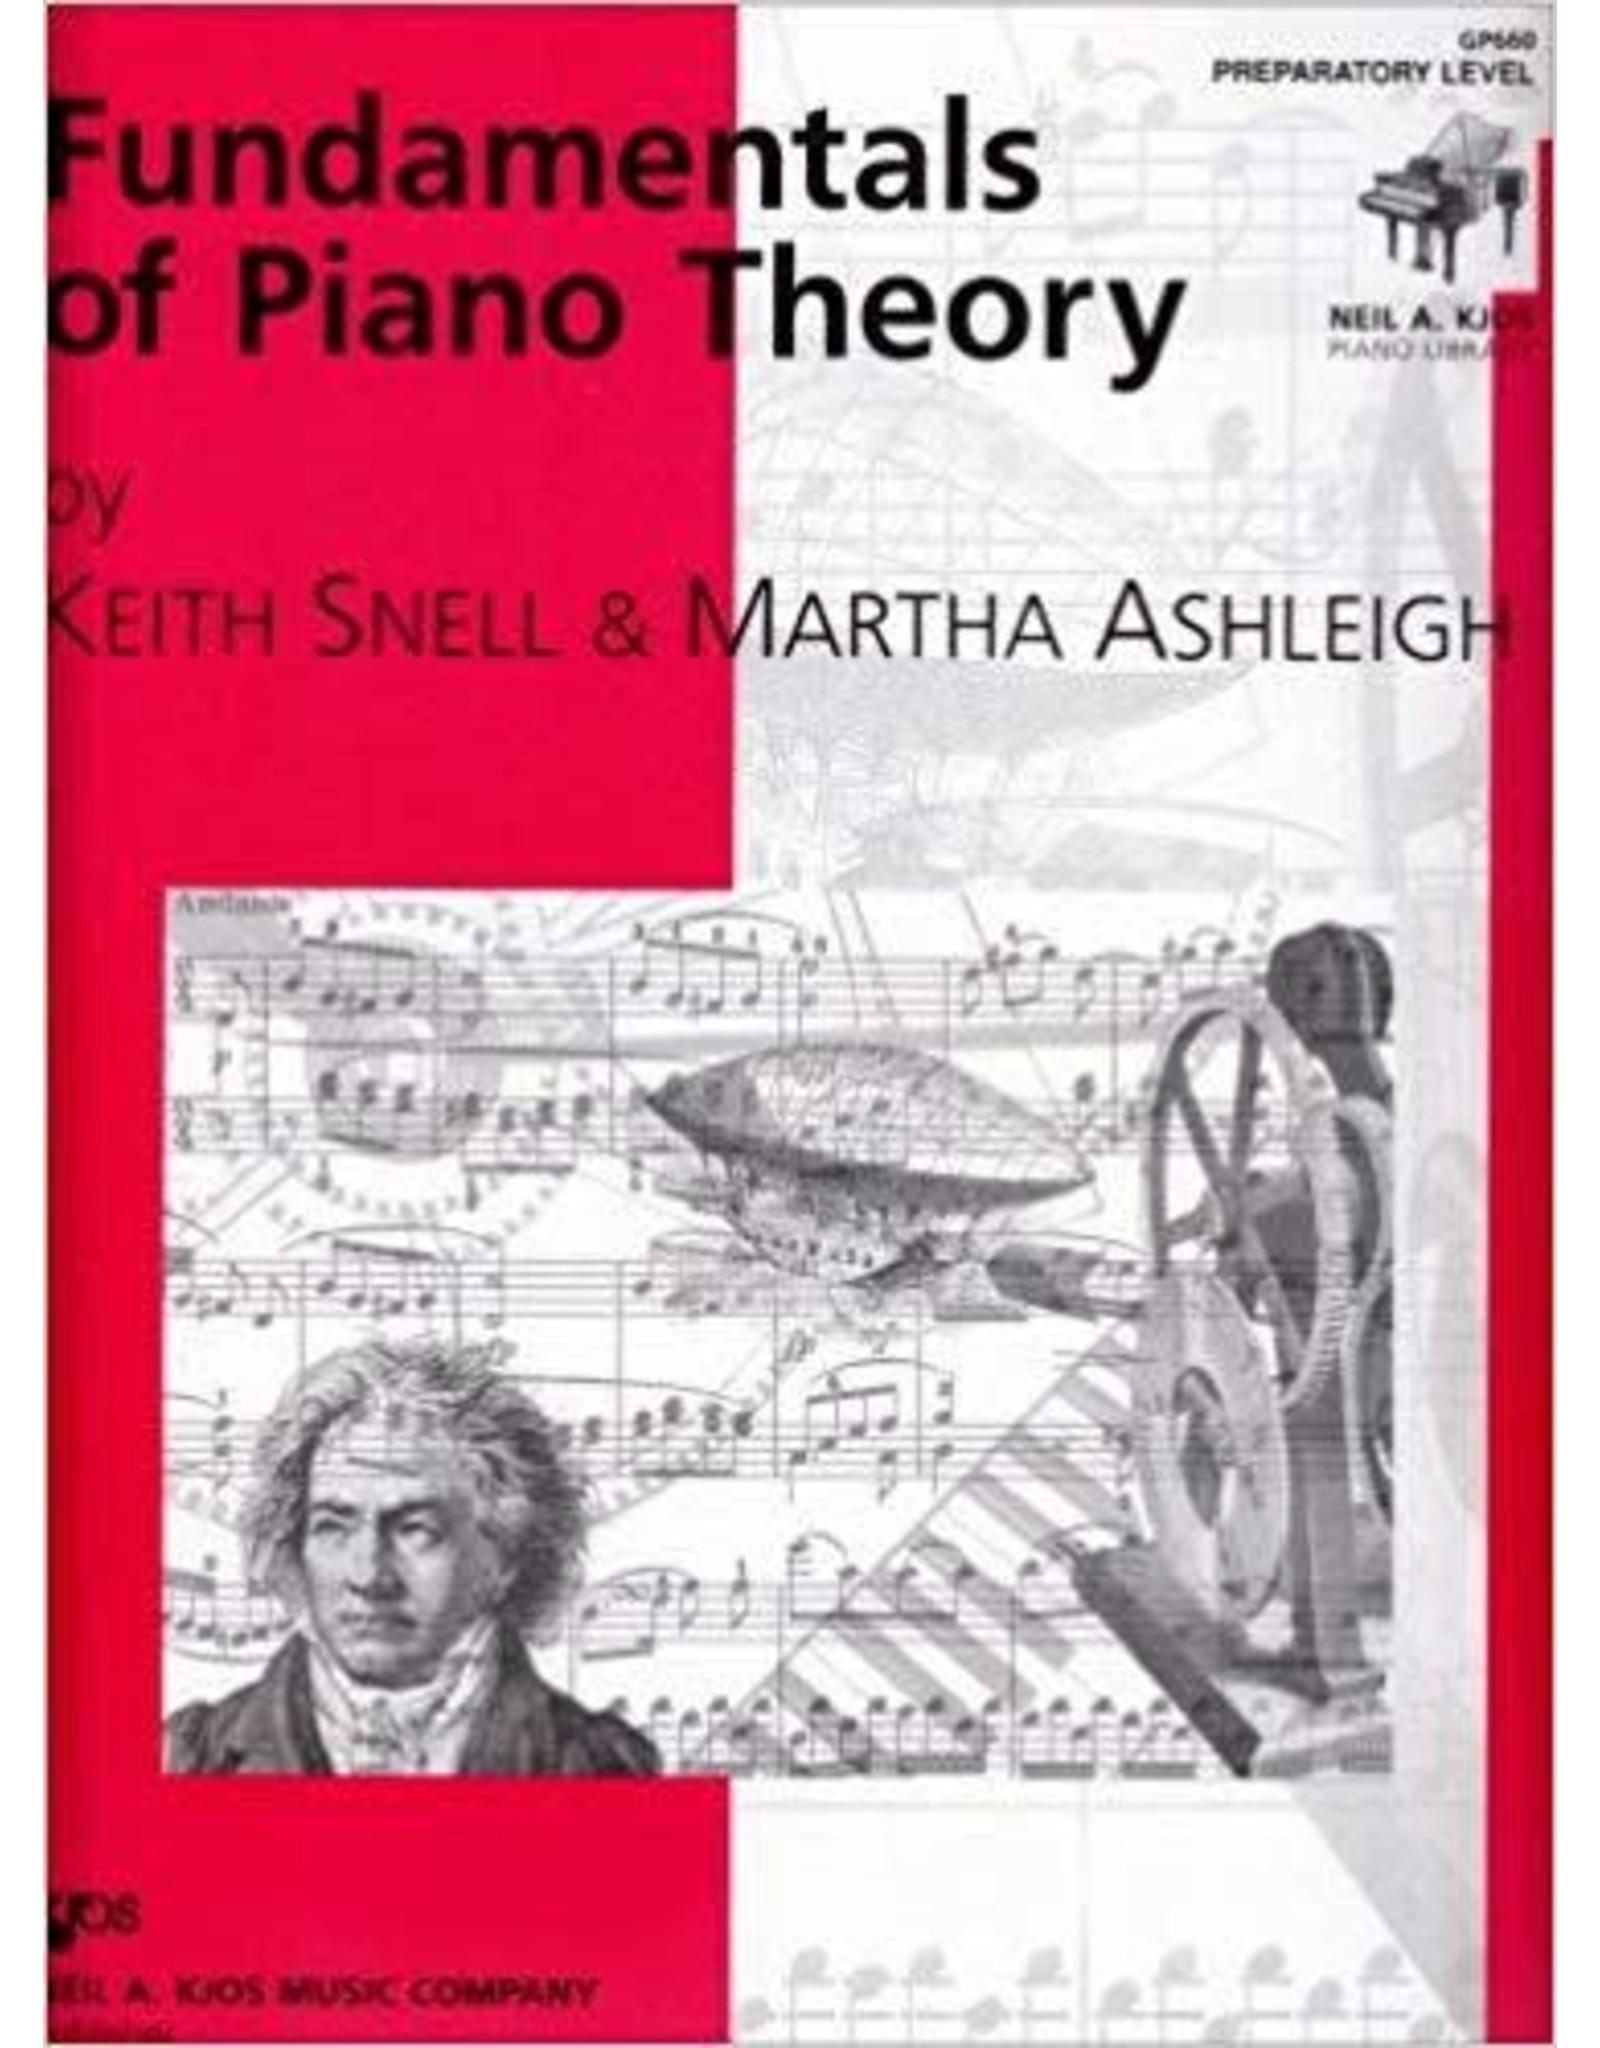 Kjos Fundamentals of Piano Theory, Preparatory Level Keith Snell